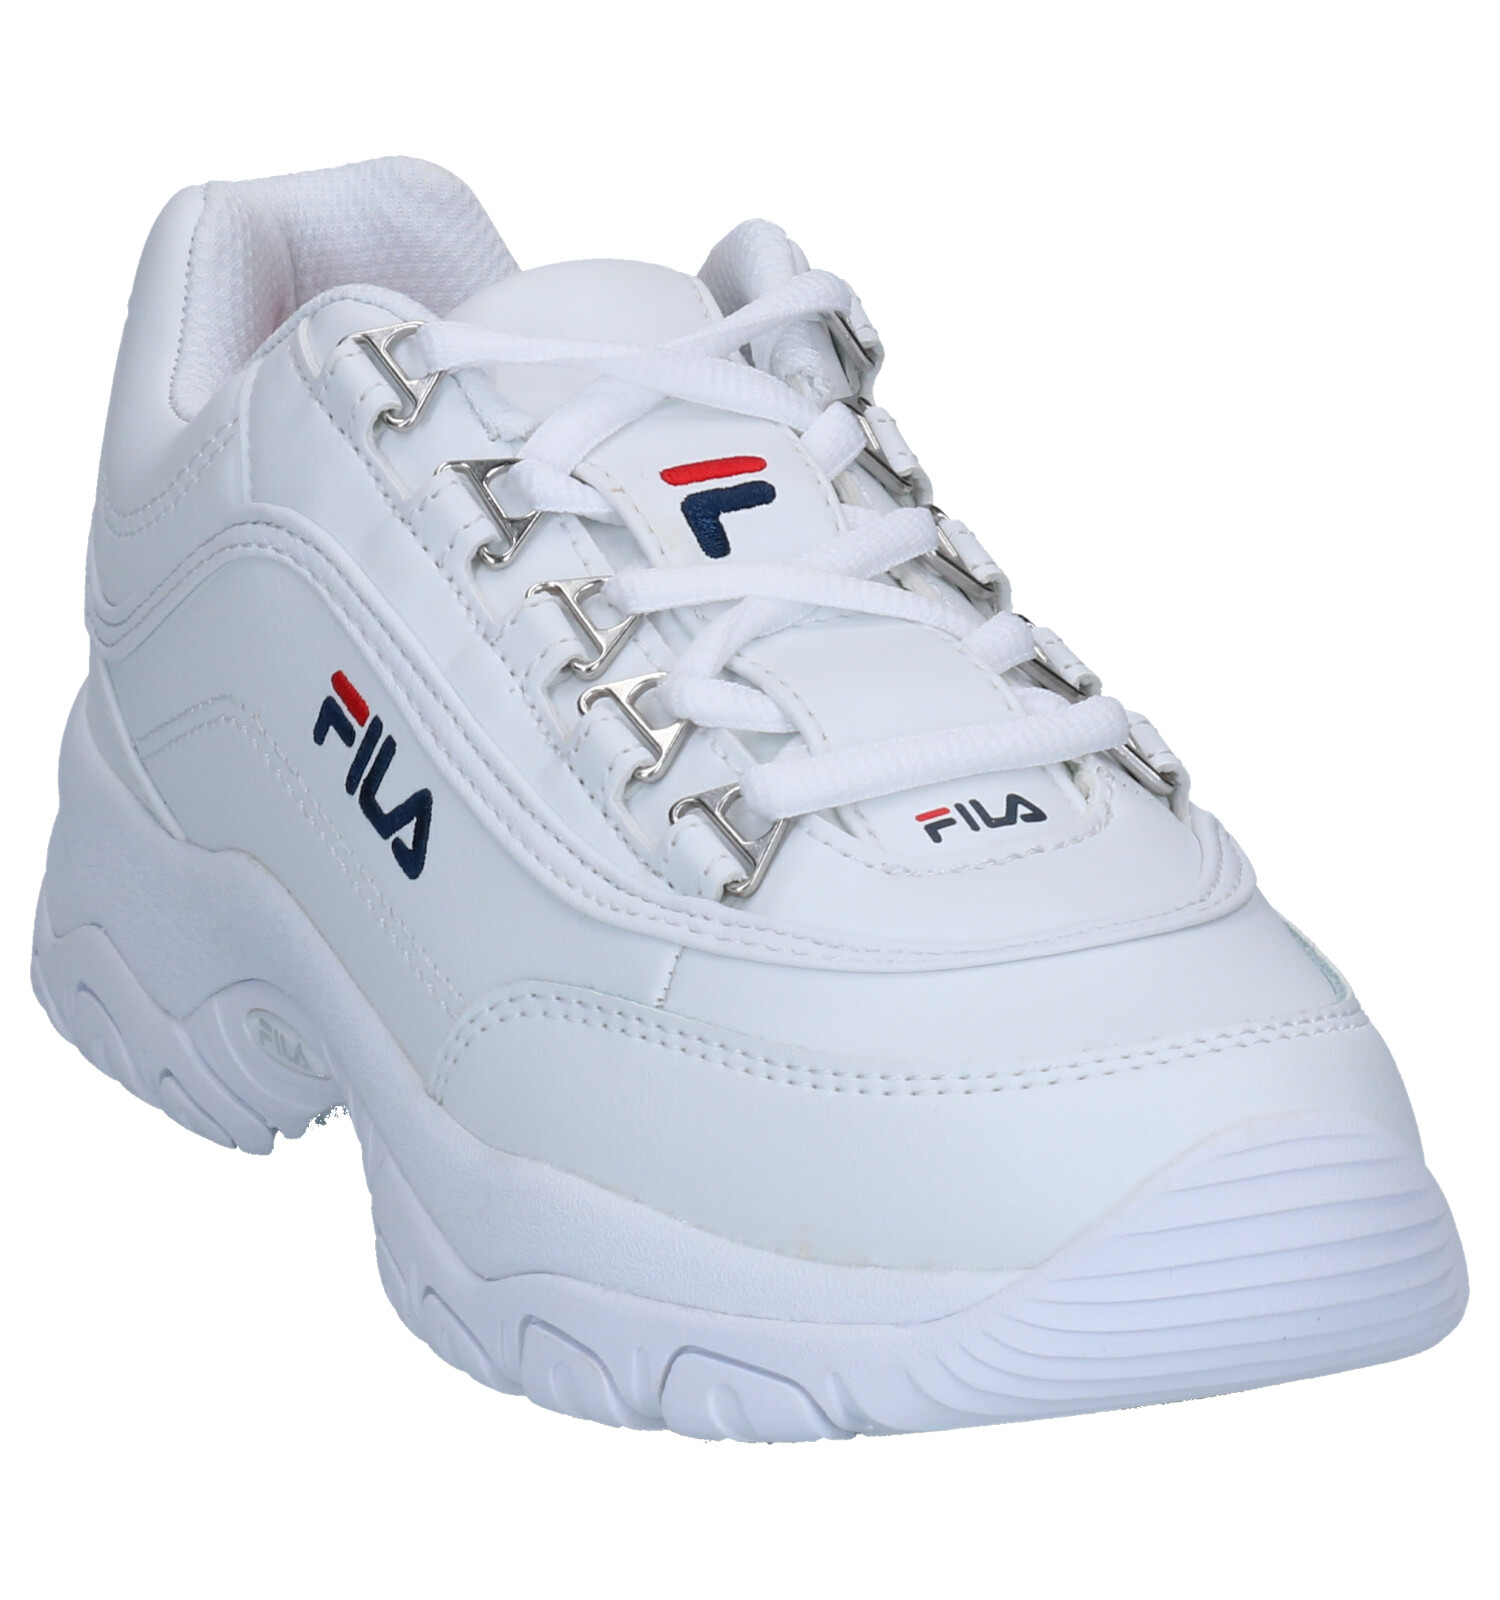 Fila Strada Low Witte Sneakers   SCHOENENTORFS.NL   Gratis